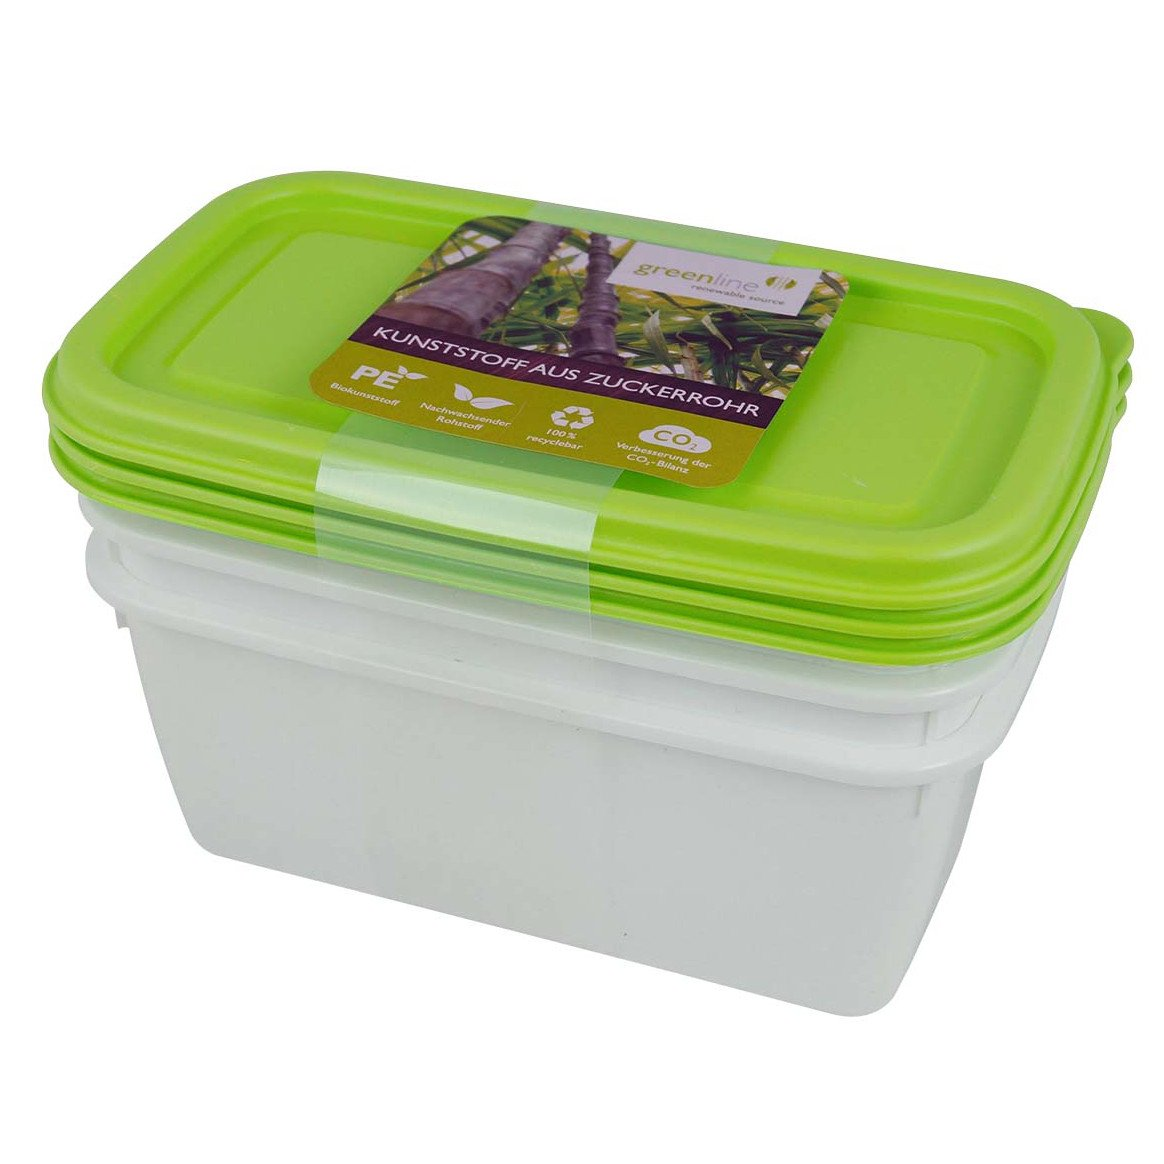 Contenitori alimenti set 3 pz 750 ml Gies Greenline